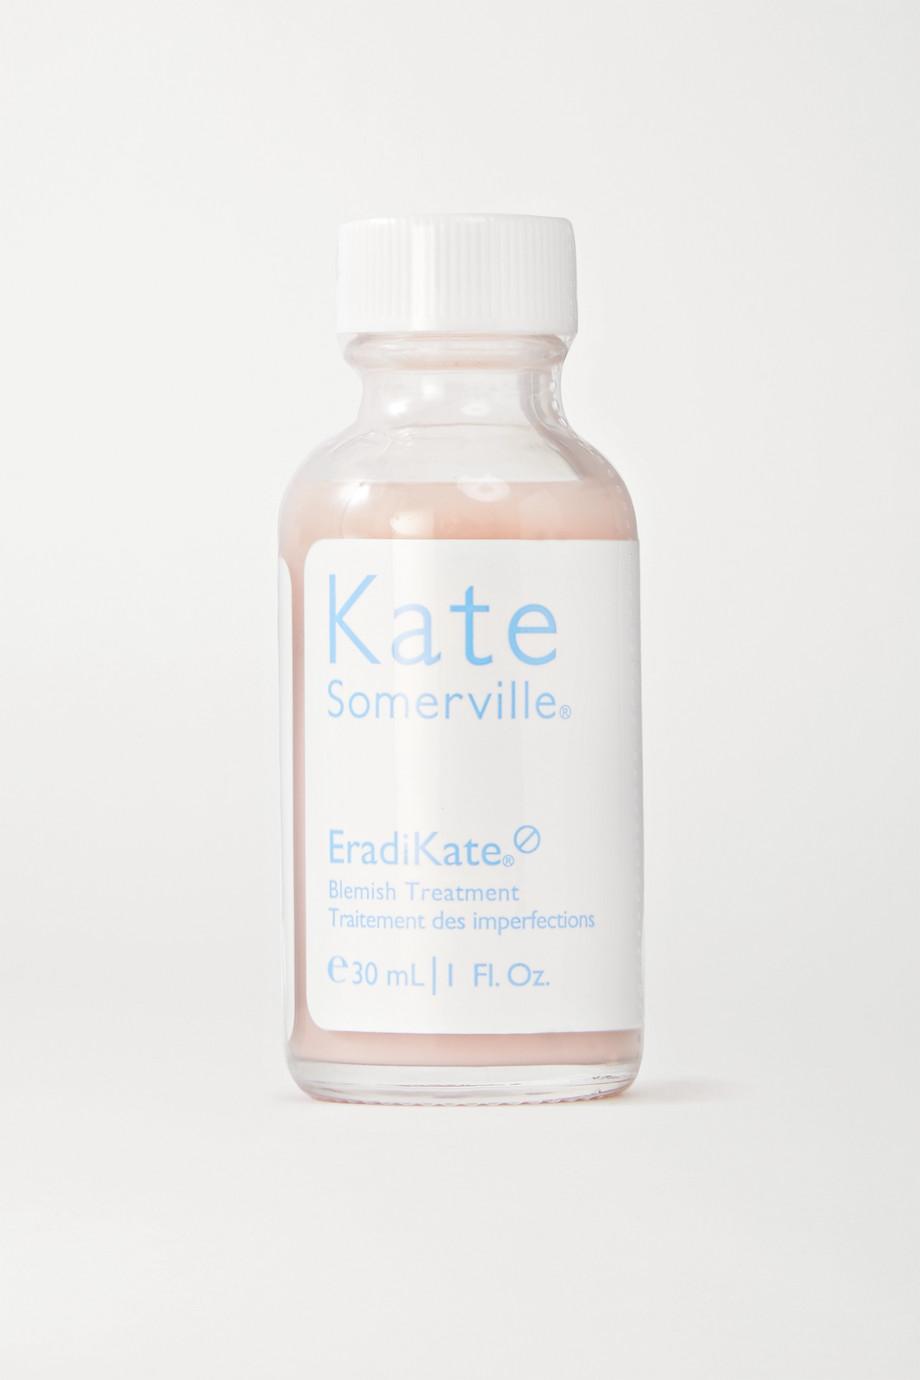 Kate Somerville EradiKate® Salicylic Acid Blemish Spot Treatment, 30 ml – Anti-Pickel-Creme